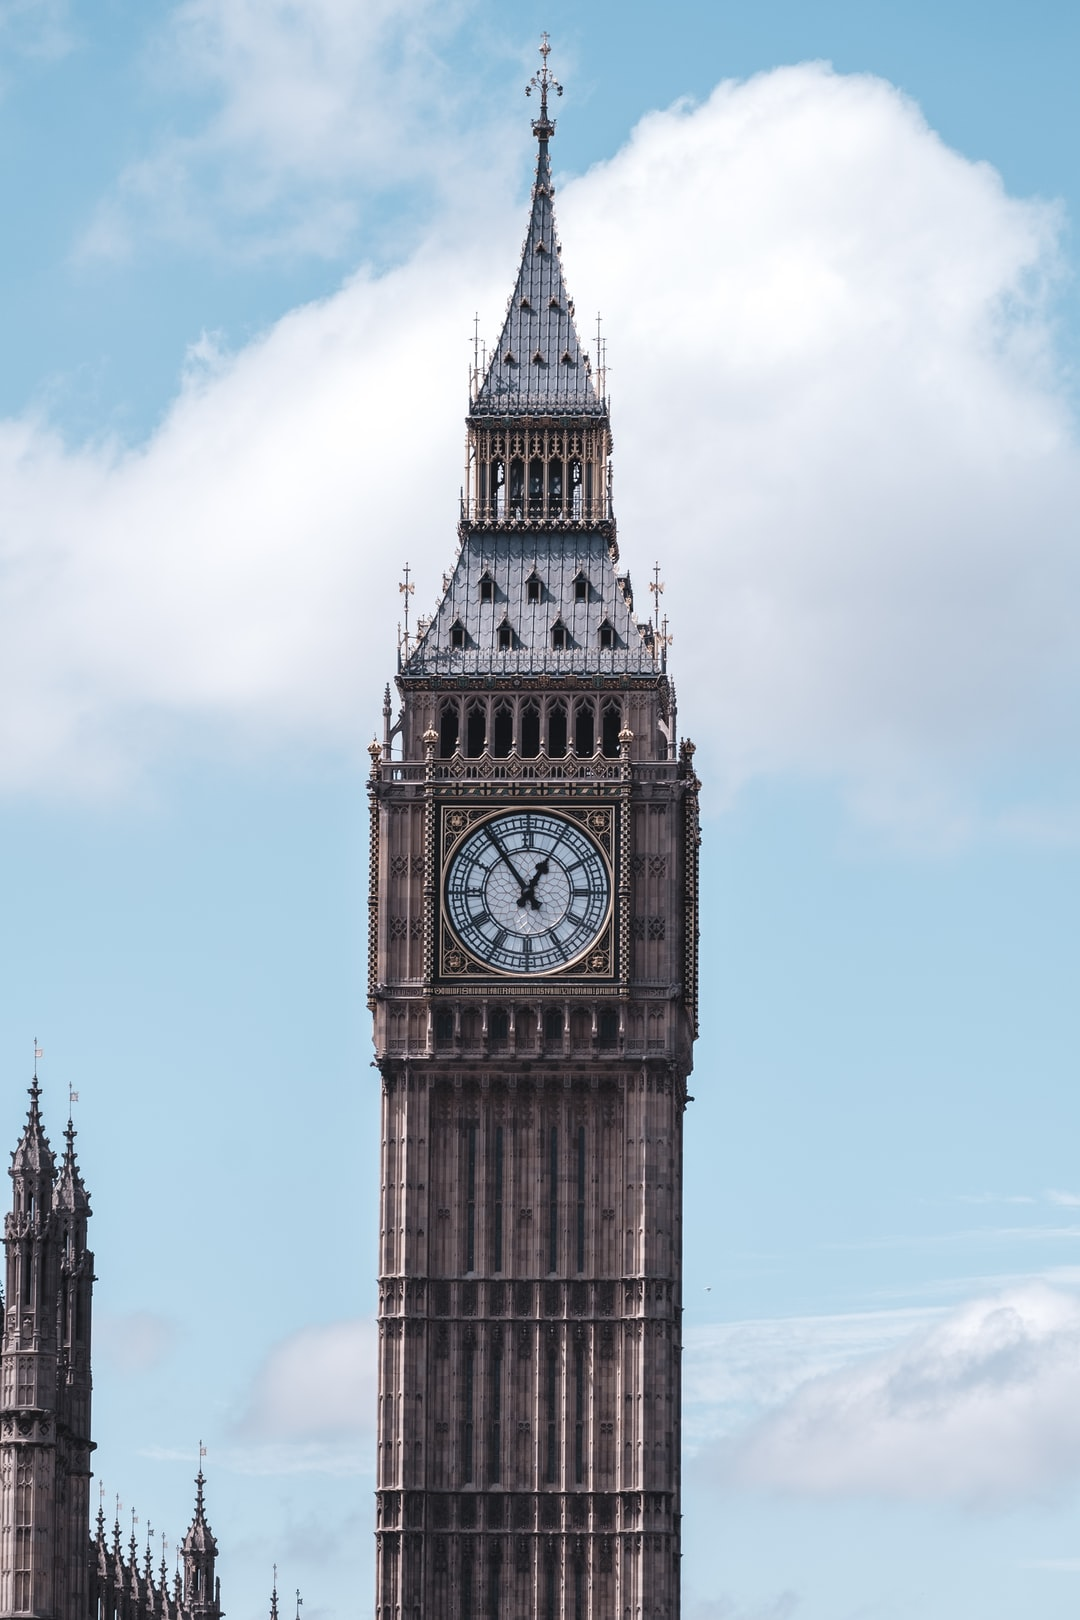 12:45 in London town